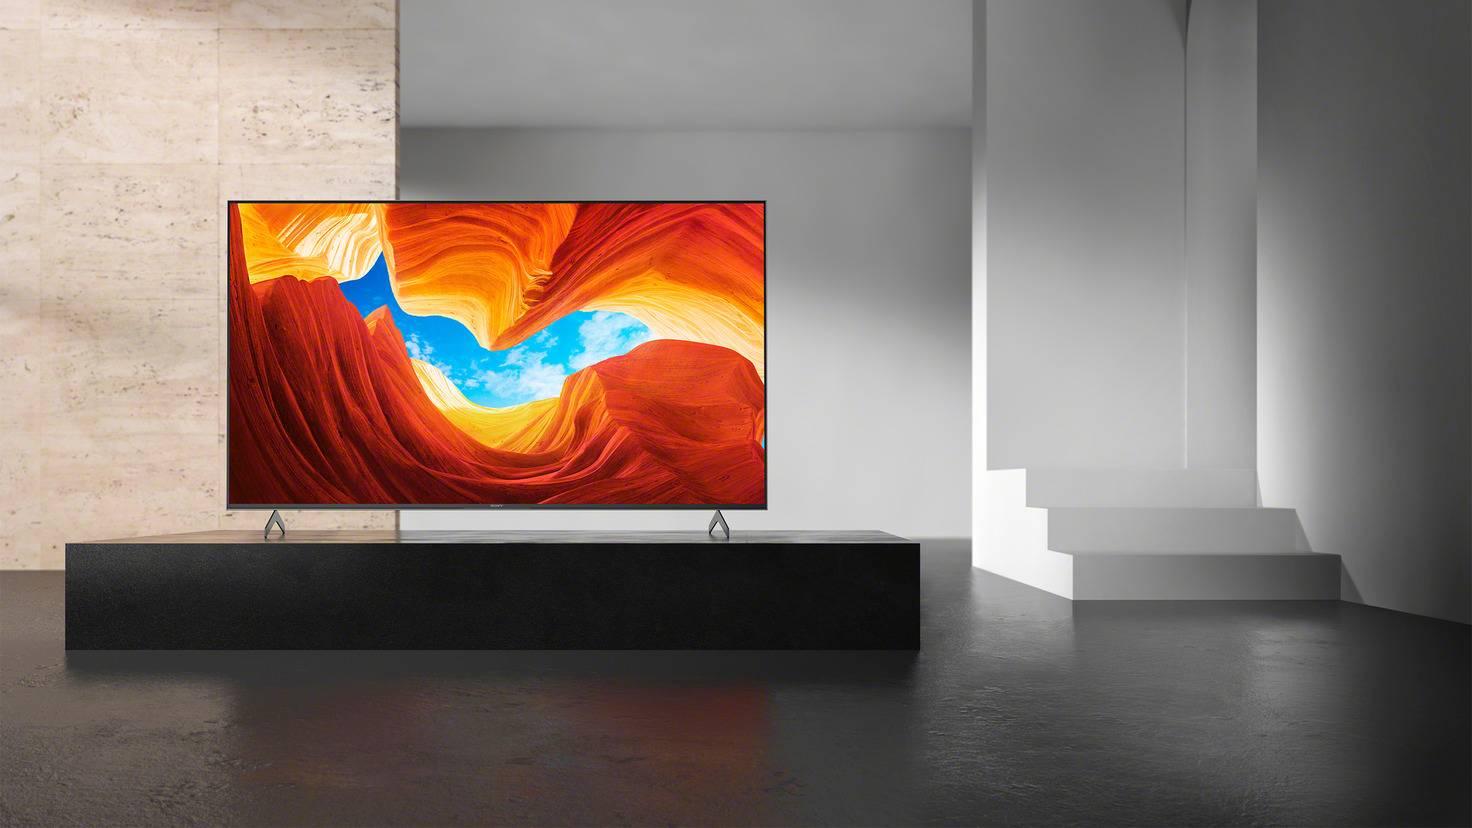 sony-xh90-fernseher-tv